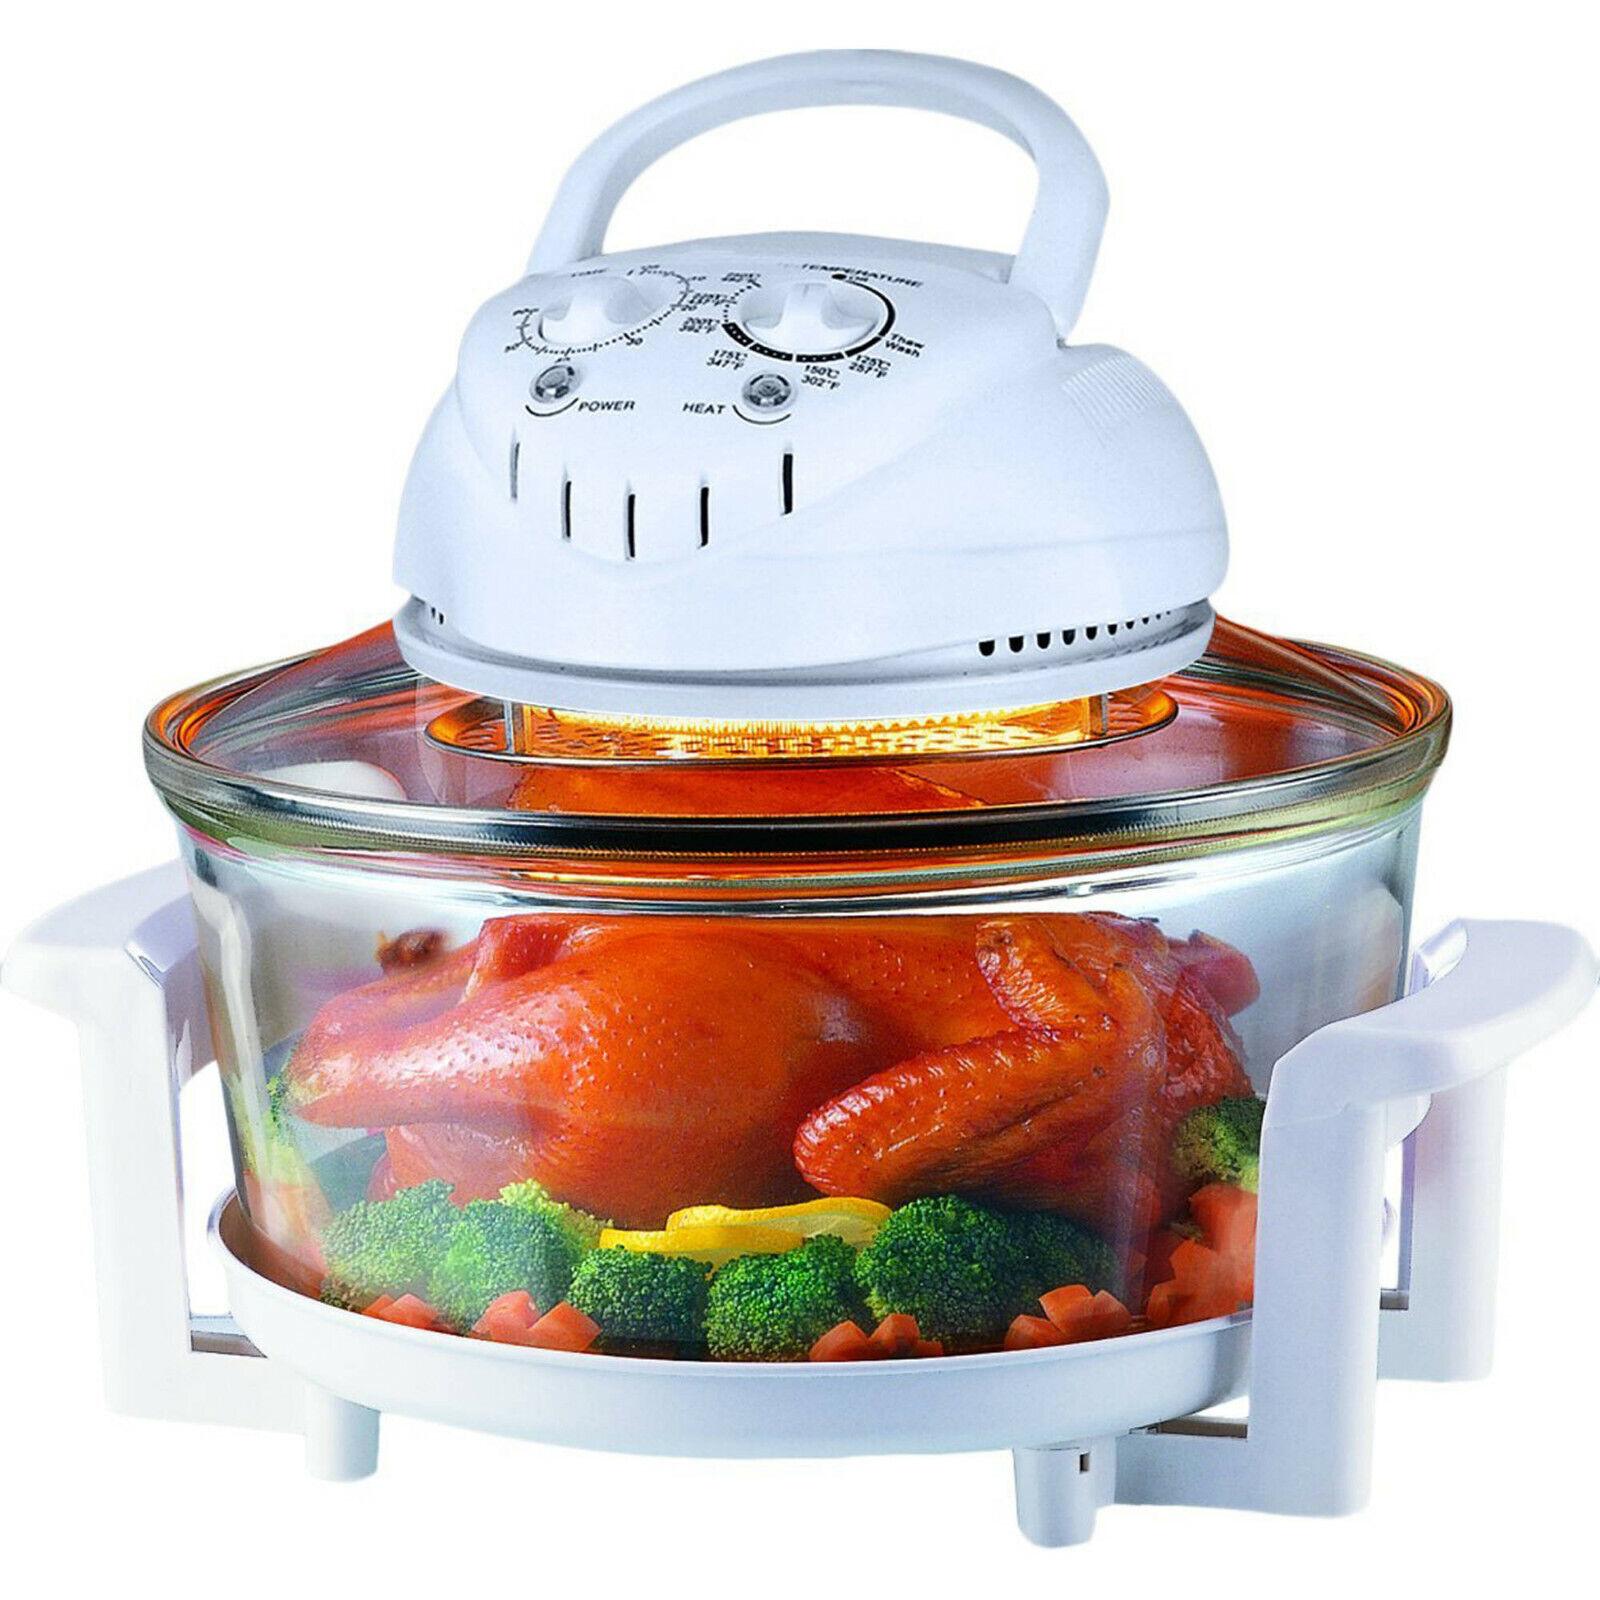 Oyama® Turbo Roaster Convection Oven